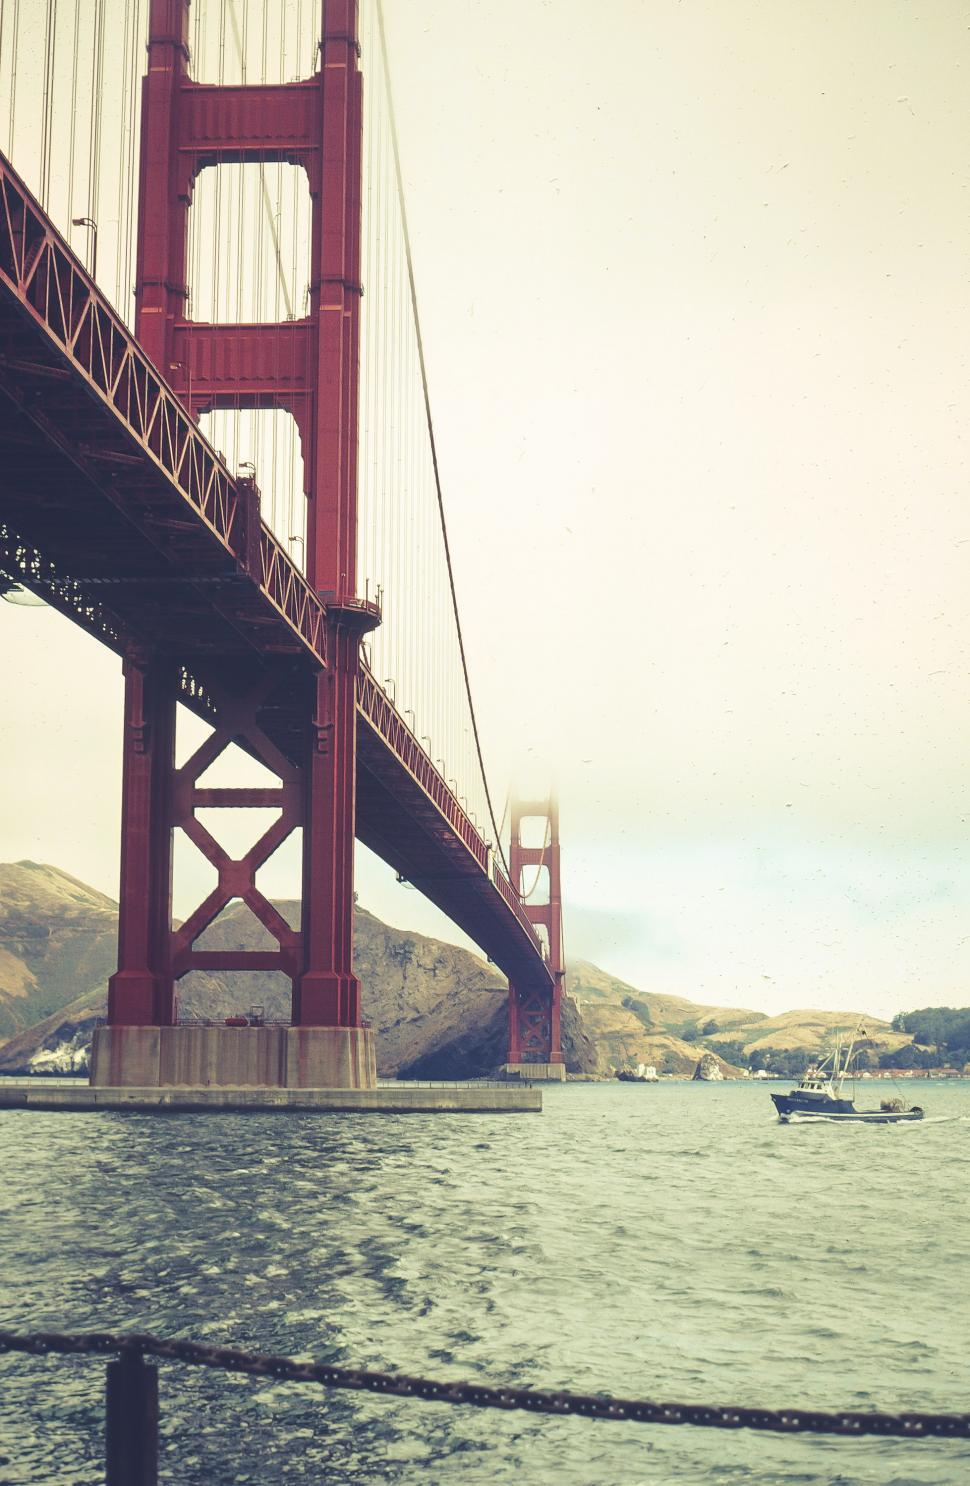 Free image of Low Angle view of Golden Gate Bridge, San Francisco, California, USA